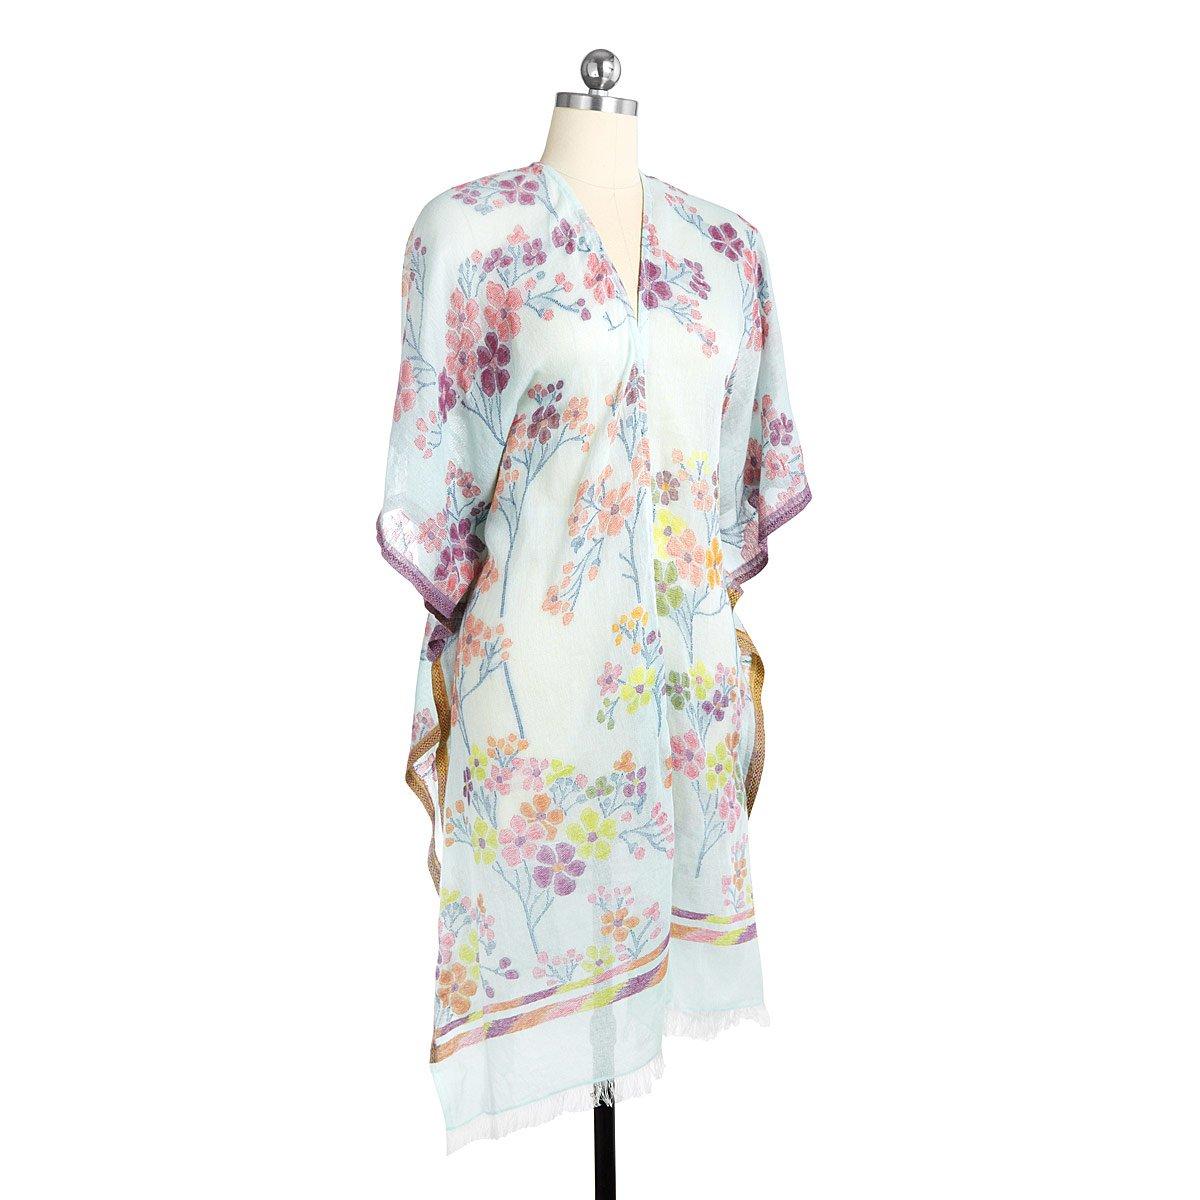 Pocket Full of Posies Kimono | UncommonGoods